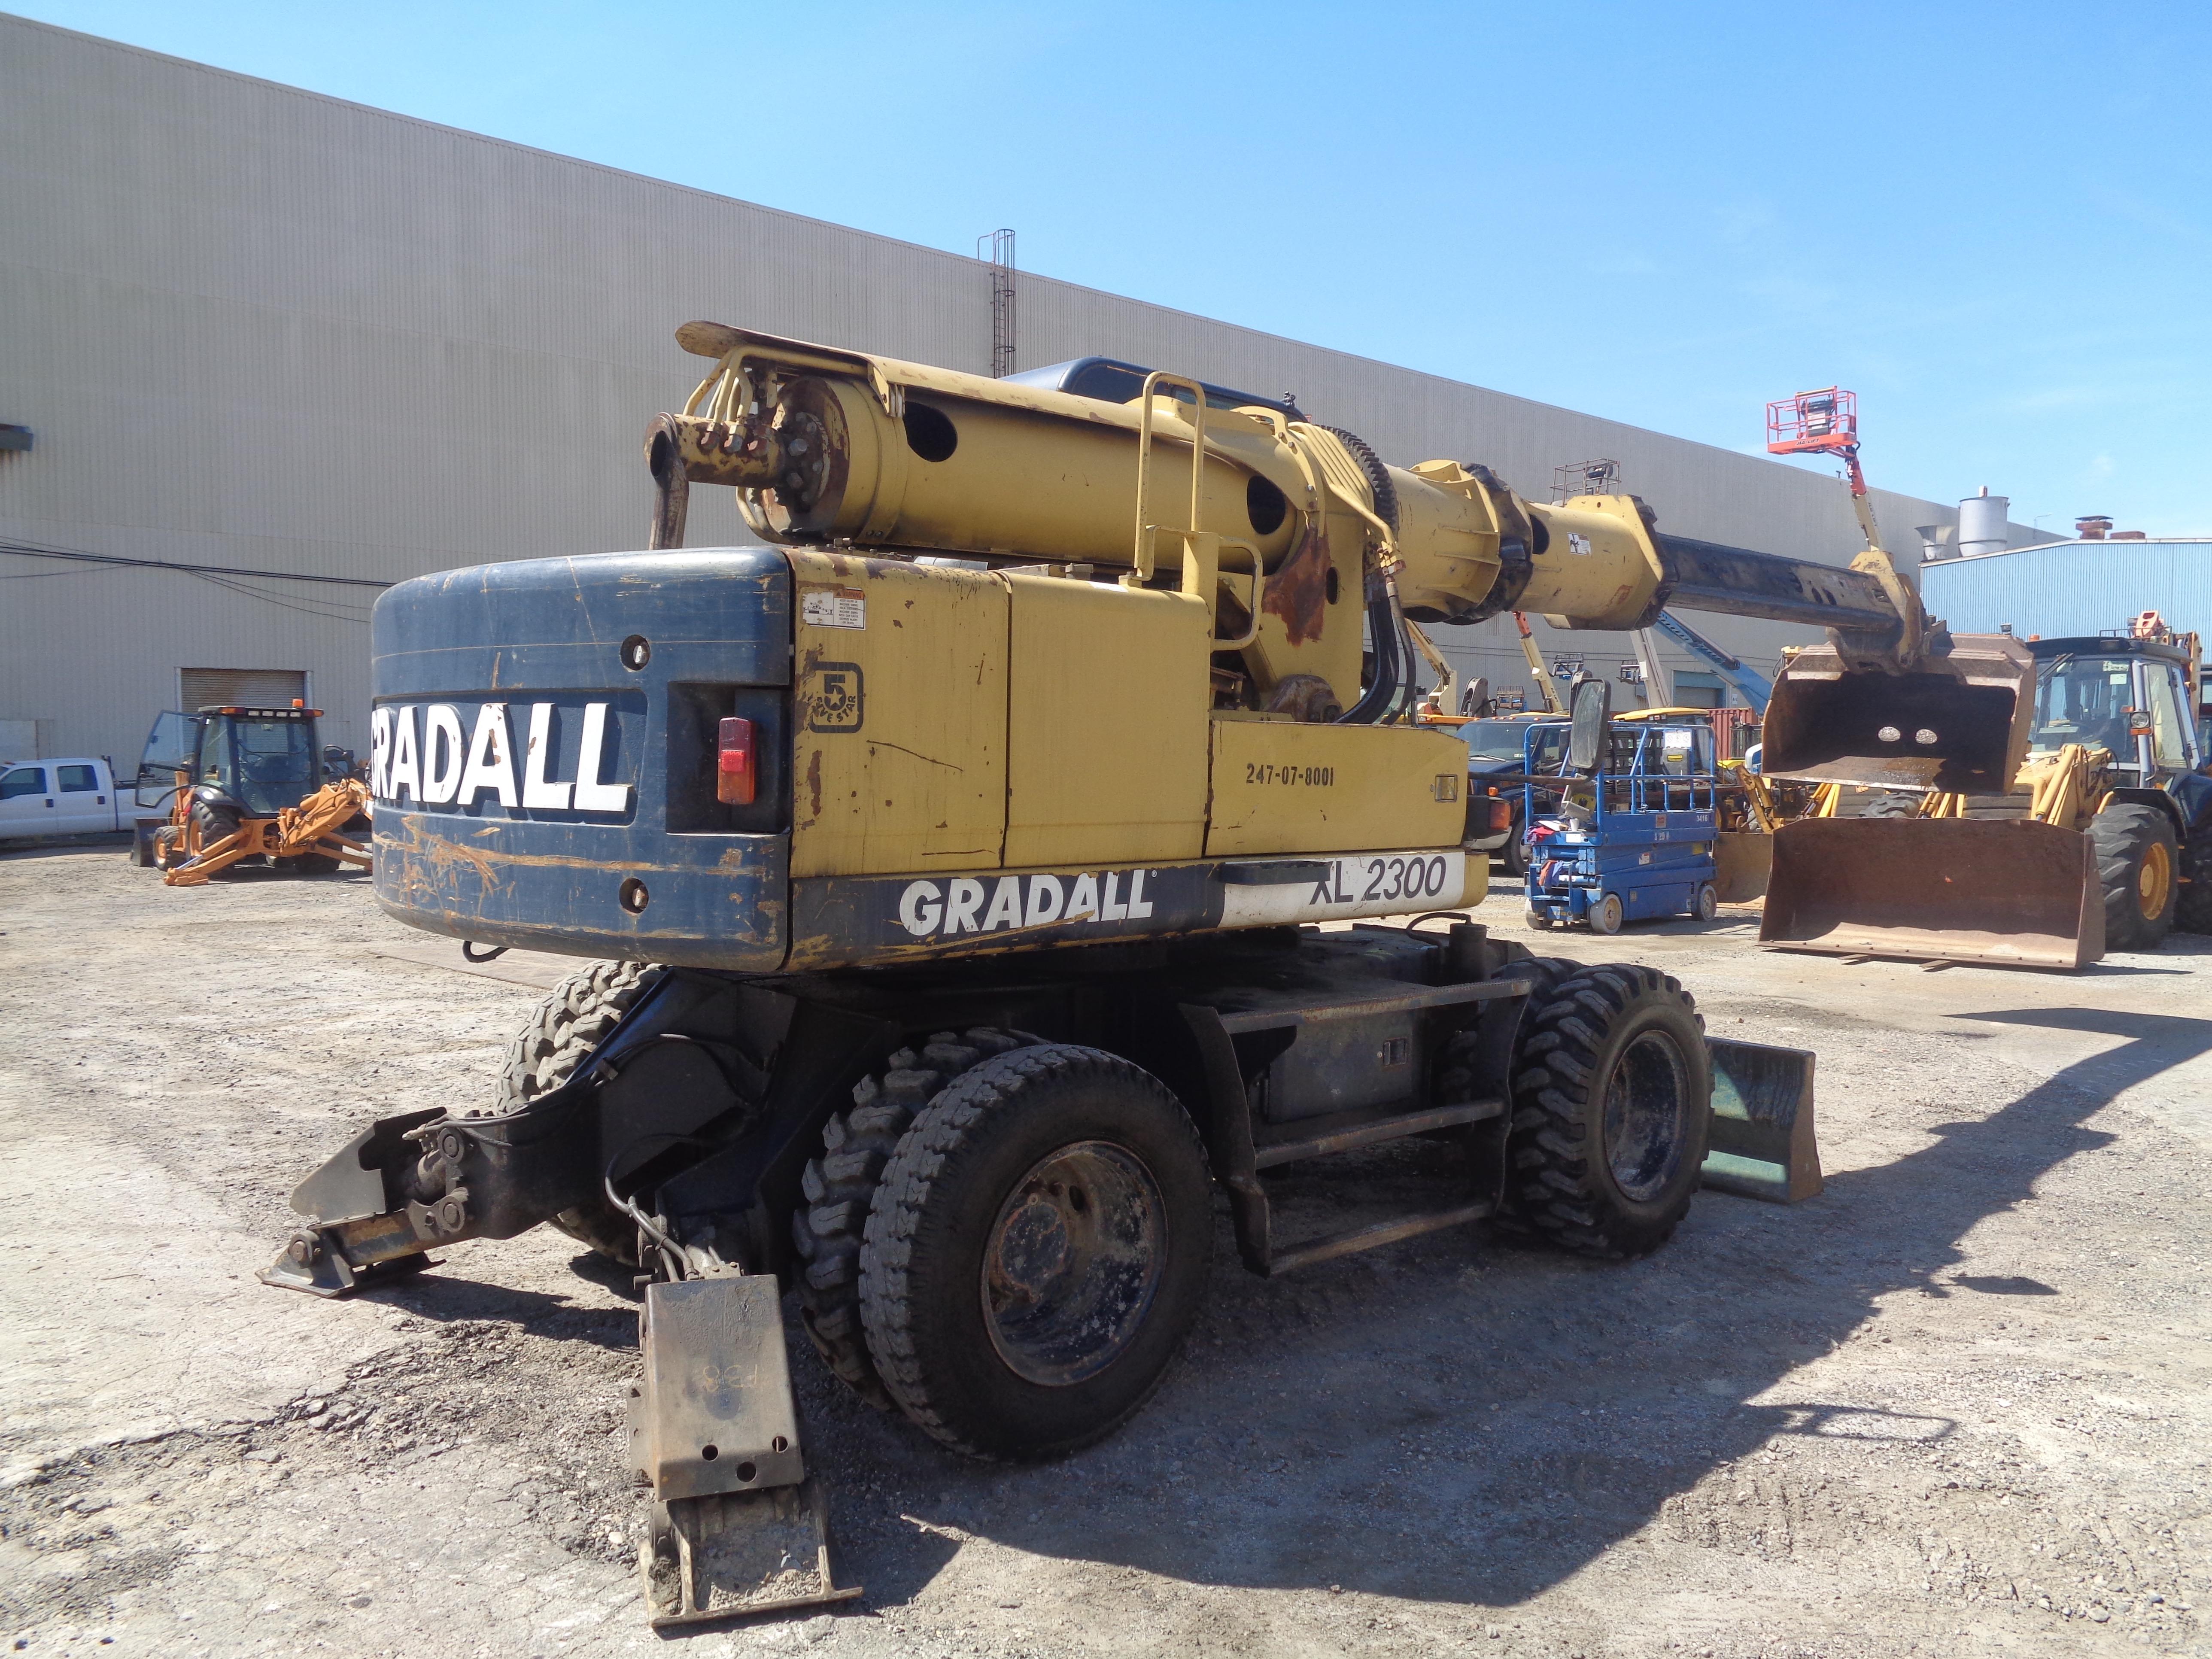 Lot 12 - 2003 Gradall Xl2300 Wheel Excavator